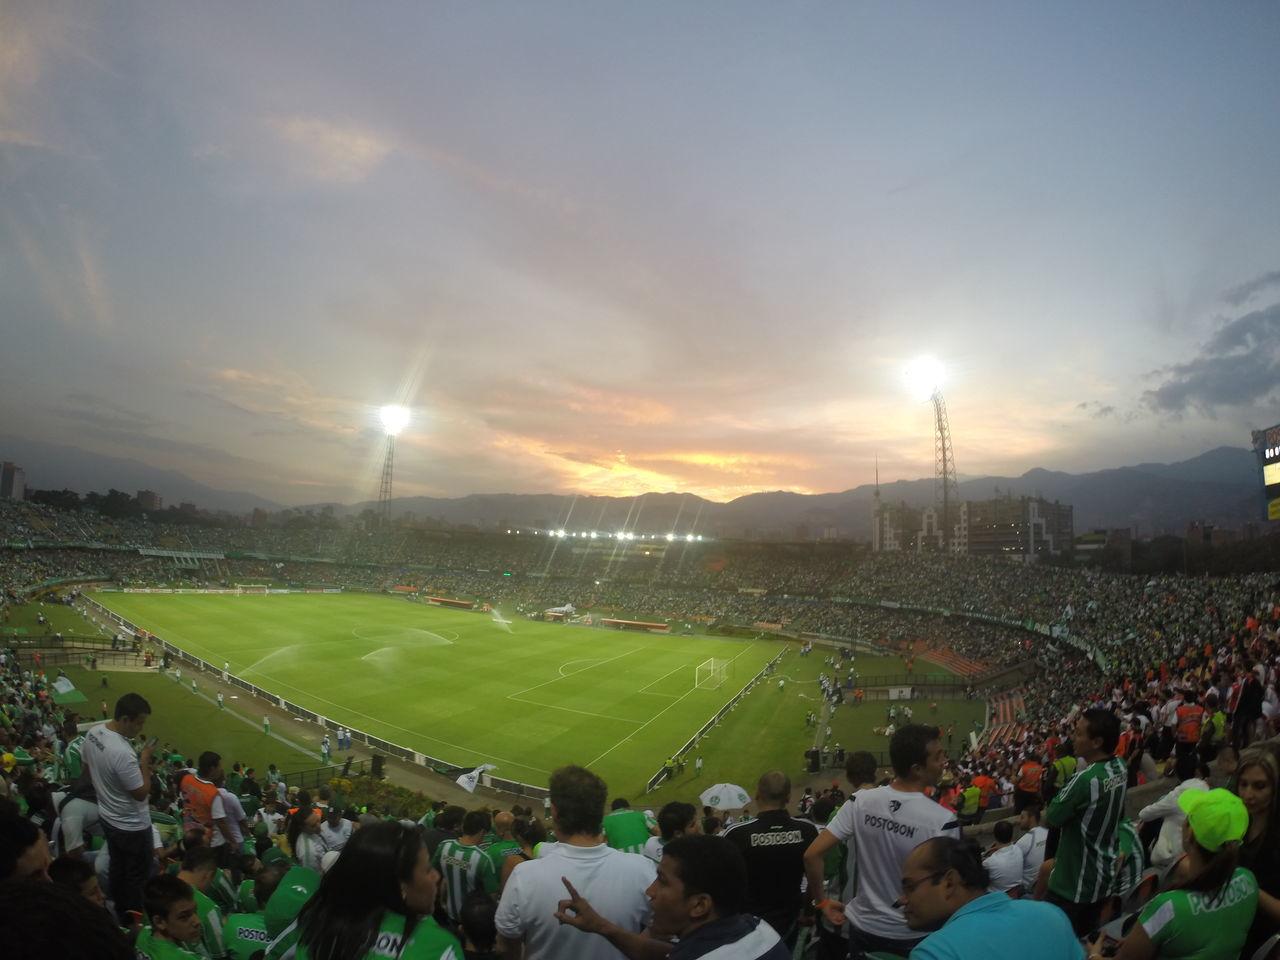 sale campeooooooon ohhhhhh oh ohhh Medellín Atanasiogirardot Copasudamericana